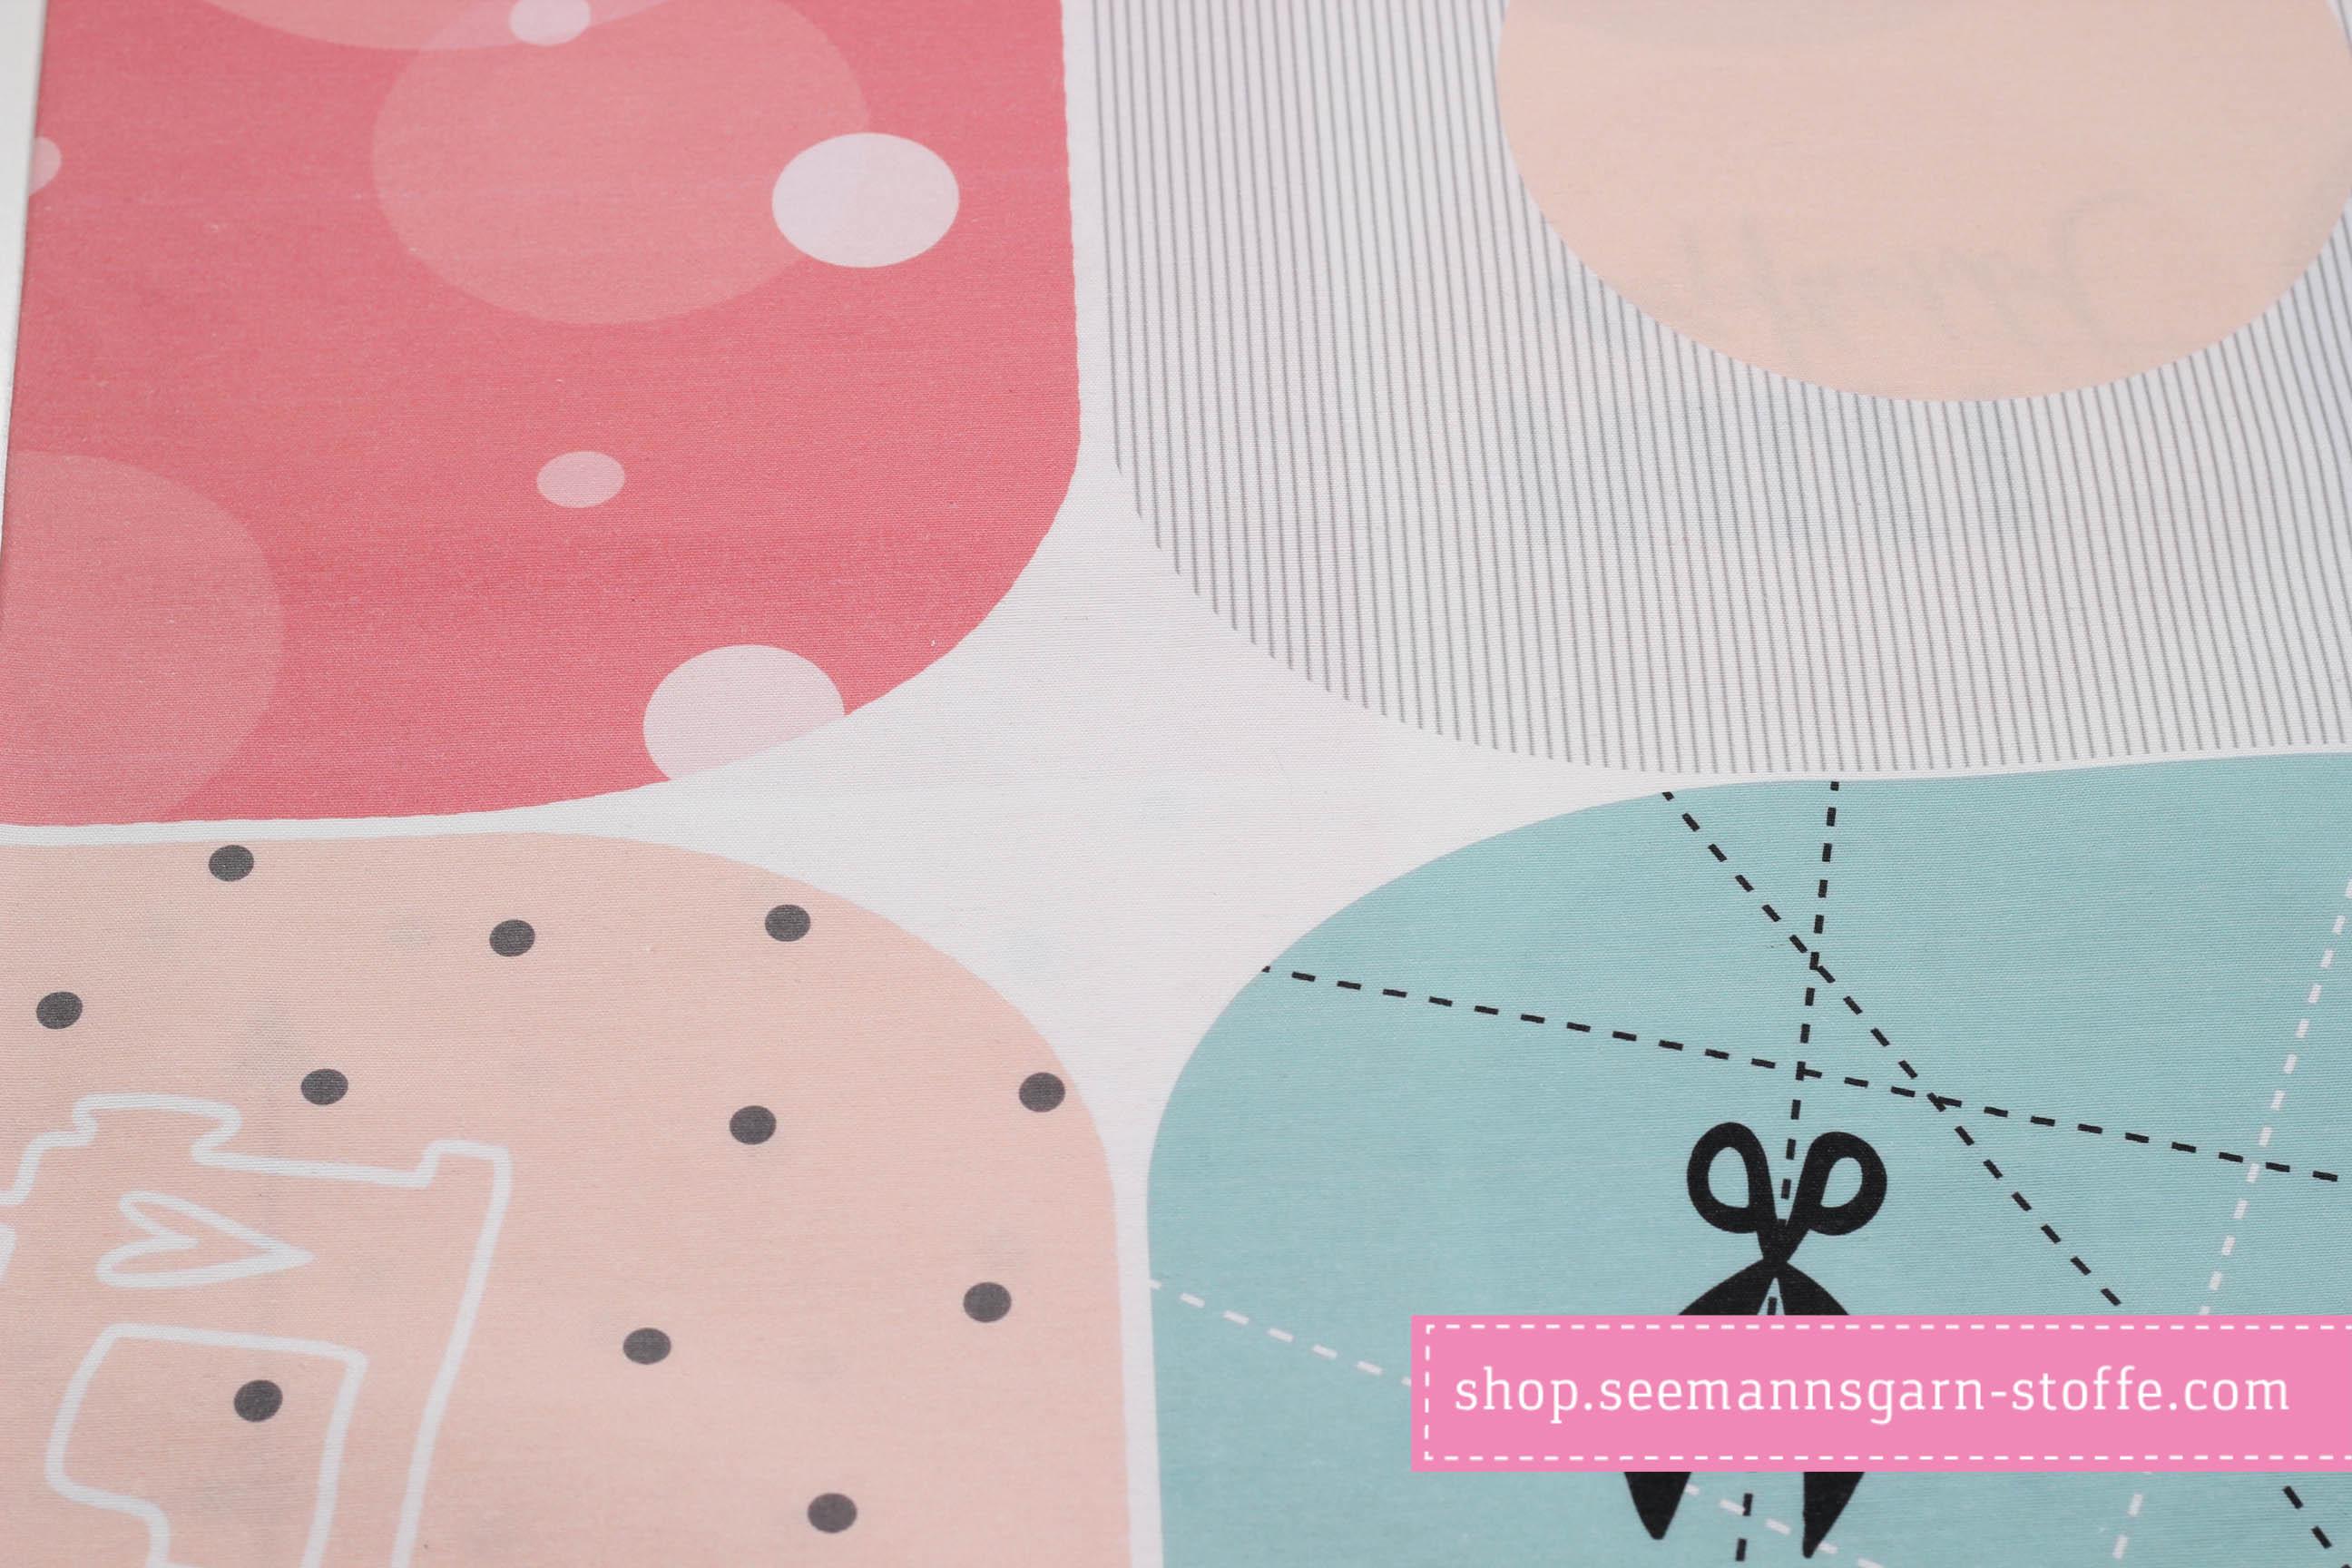 Webware Dekostoff - Taschenpanel Cut & Sew - DIY - Panel - Taschen - Leni Pepunkt - Nähset - Canvas - Nähen -